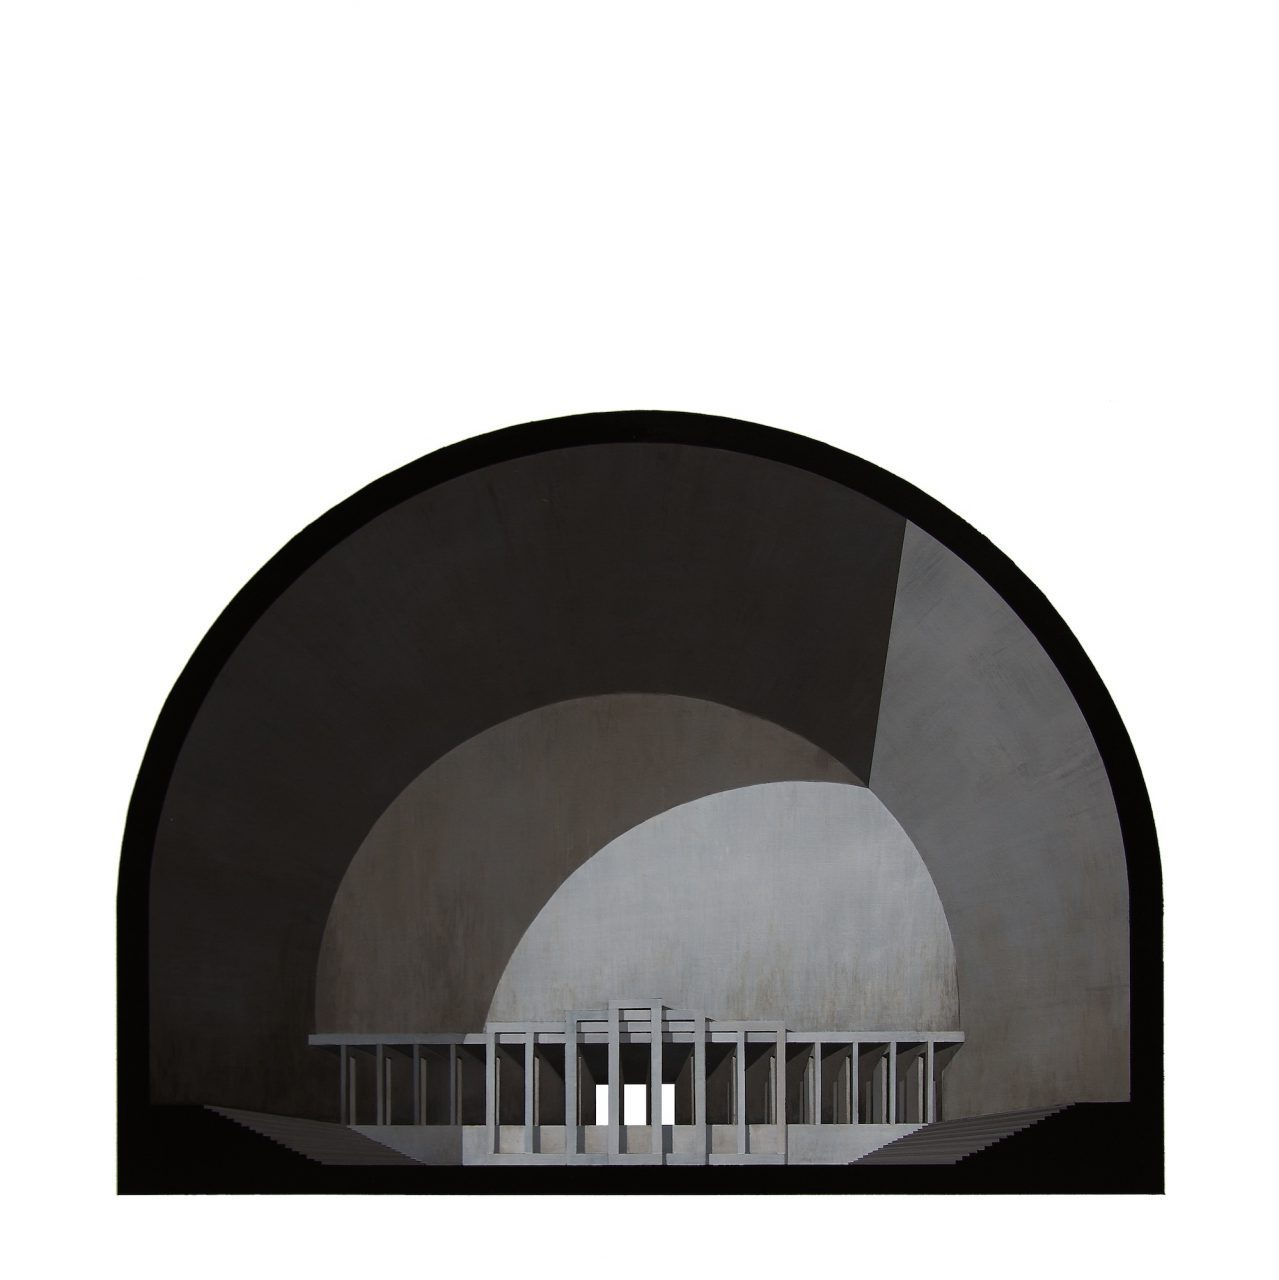 The Form of the Form. Exhibition at MAAT, Av. de Brasília, Central Tejo 1300-598 Lisbon